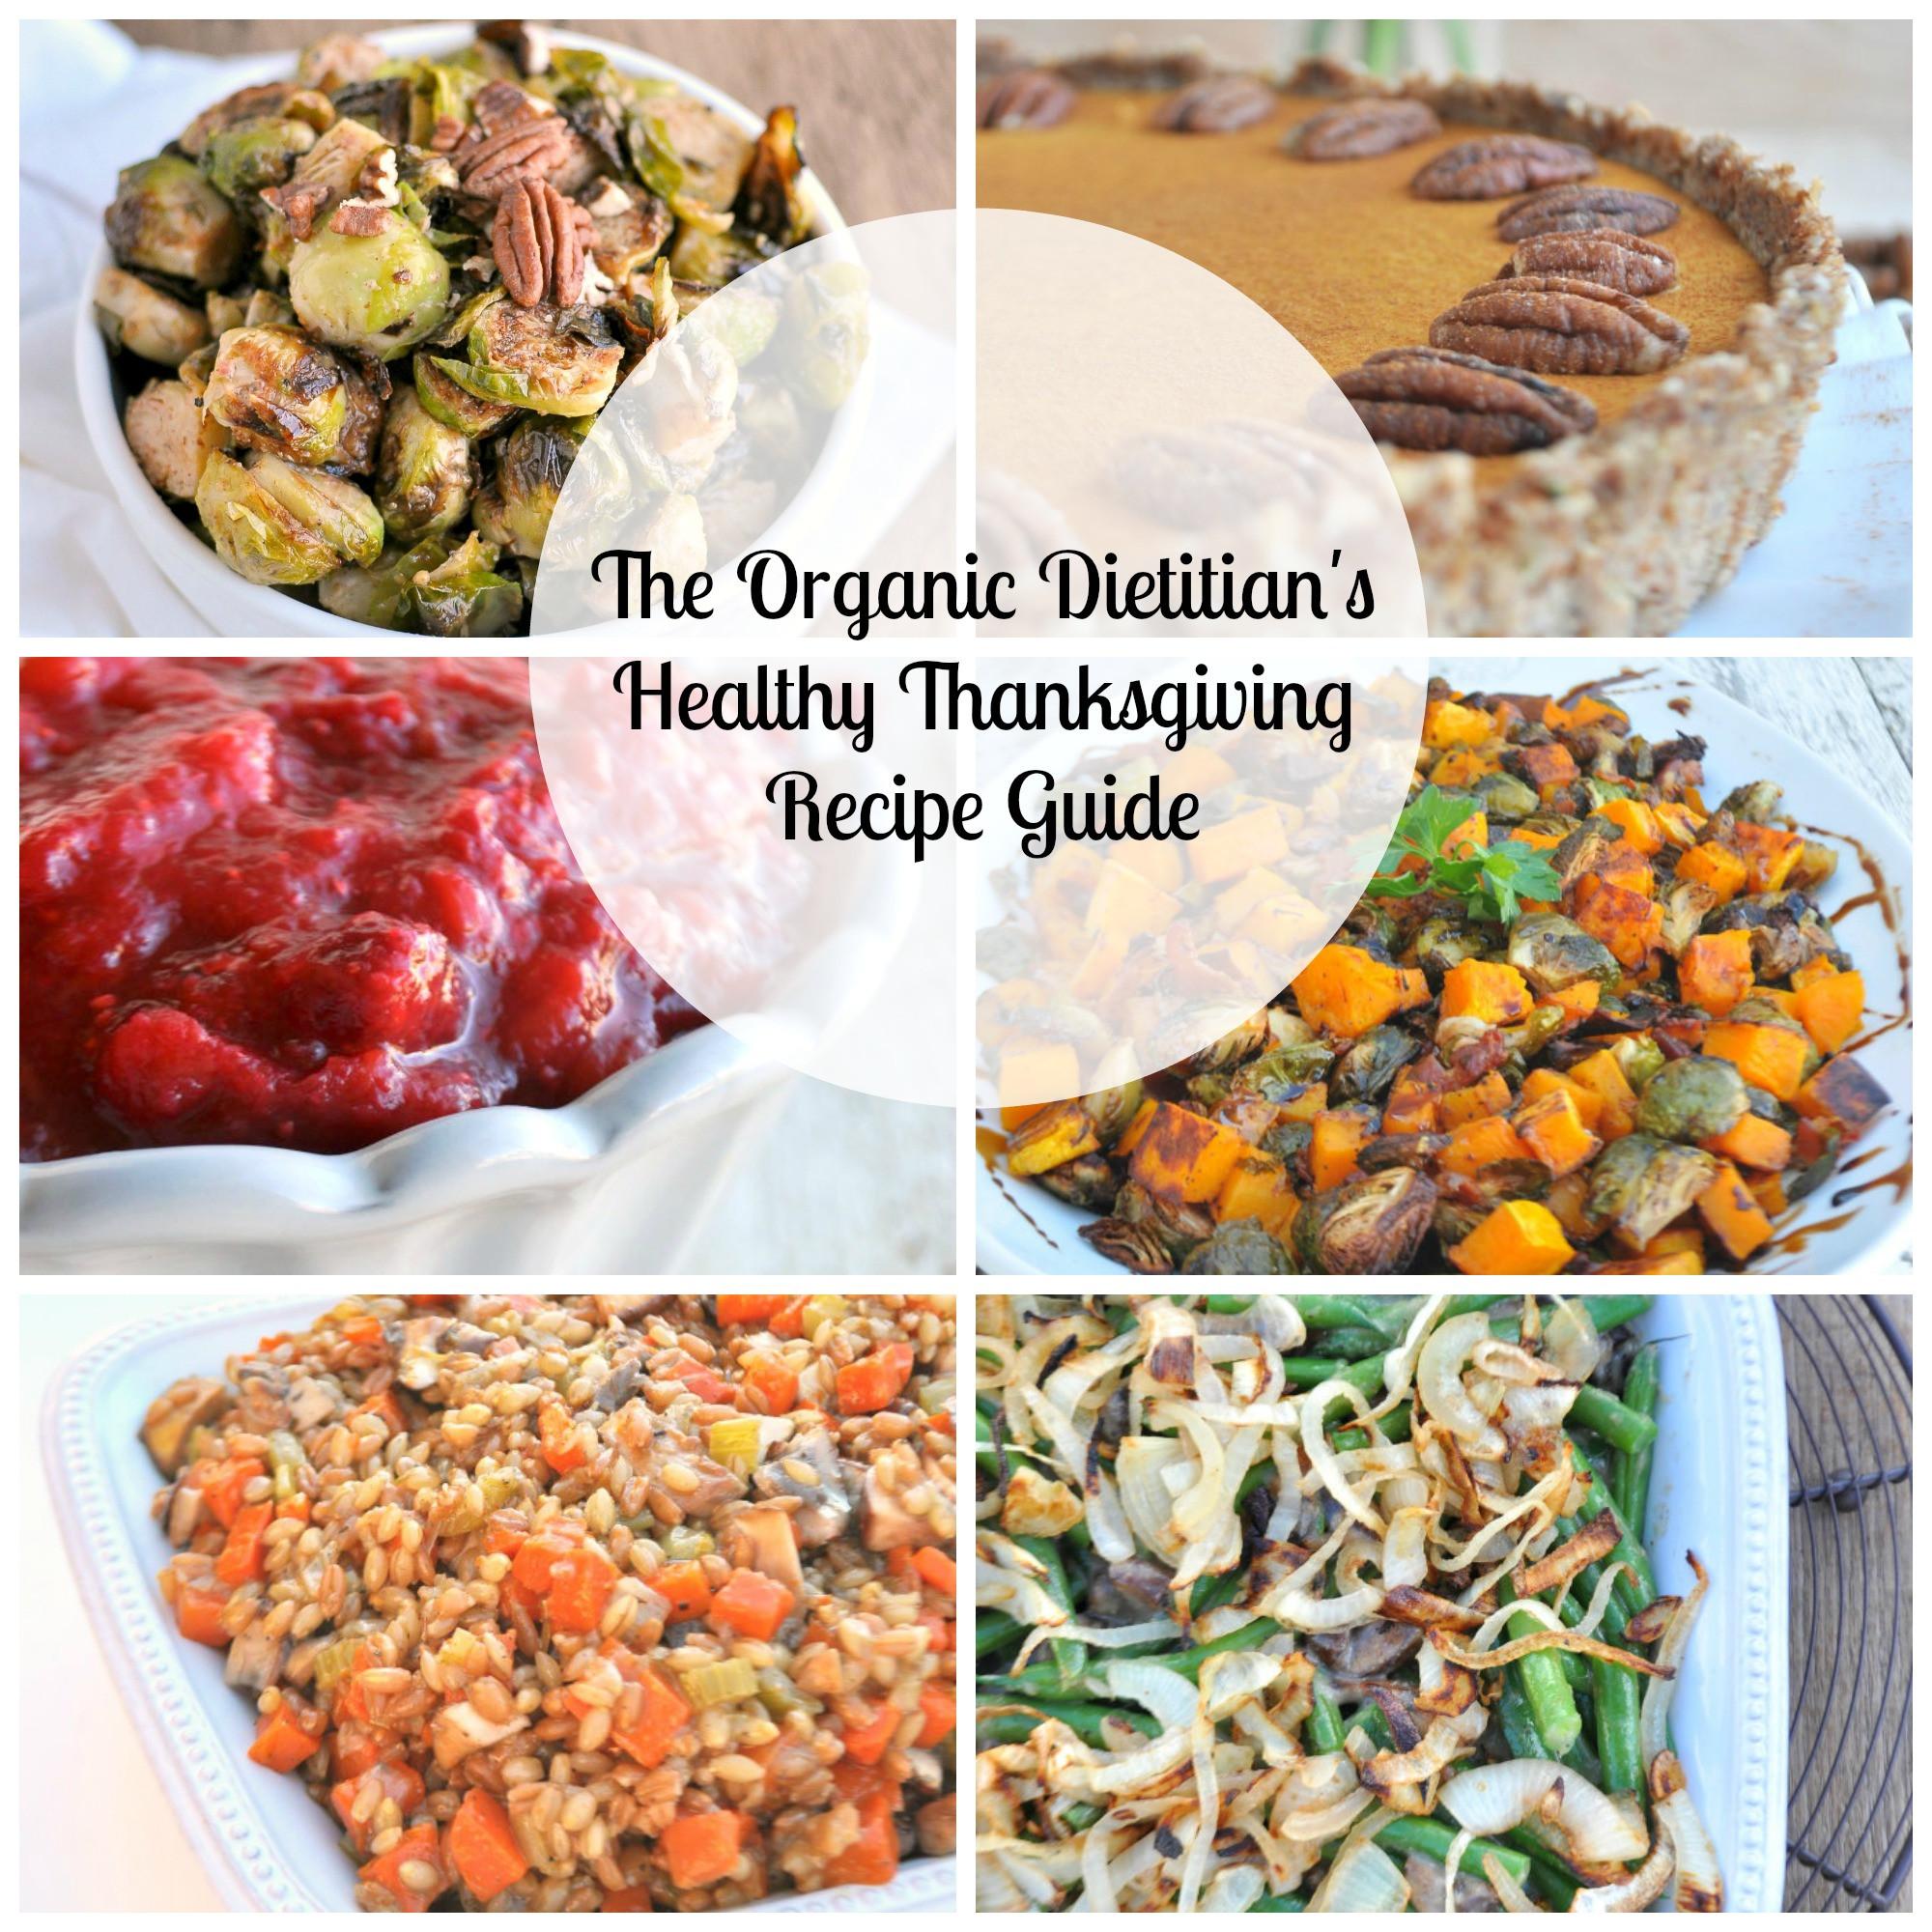 Healthy Thanksgiving Turkey Recipes  The Organic Dietitian s Healthy Thanksgiving Recipe Guide